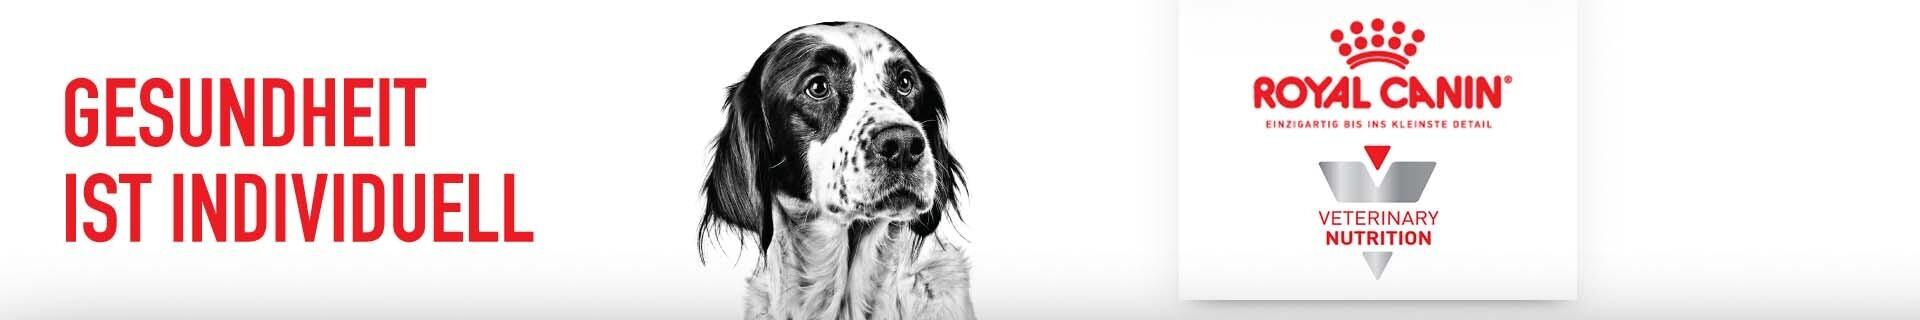 Royal Canin Veterinary Diet Diätfutter für Hunde